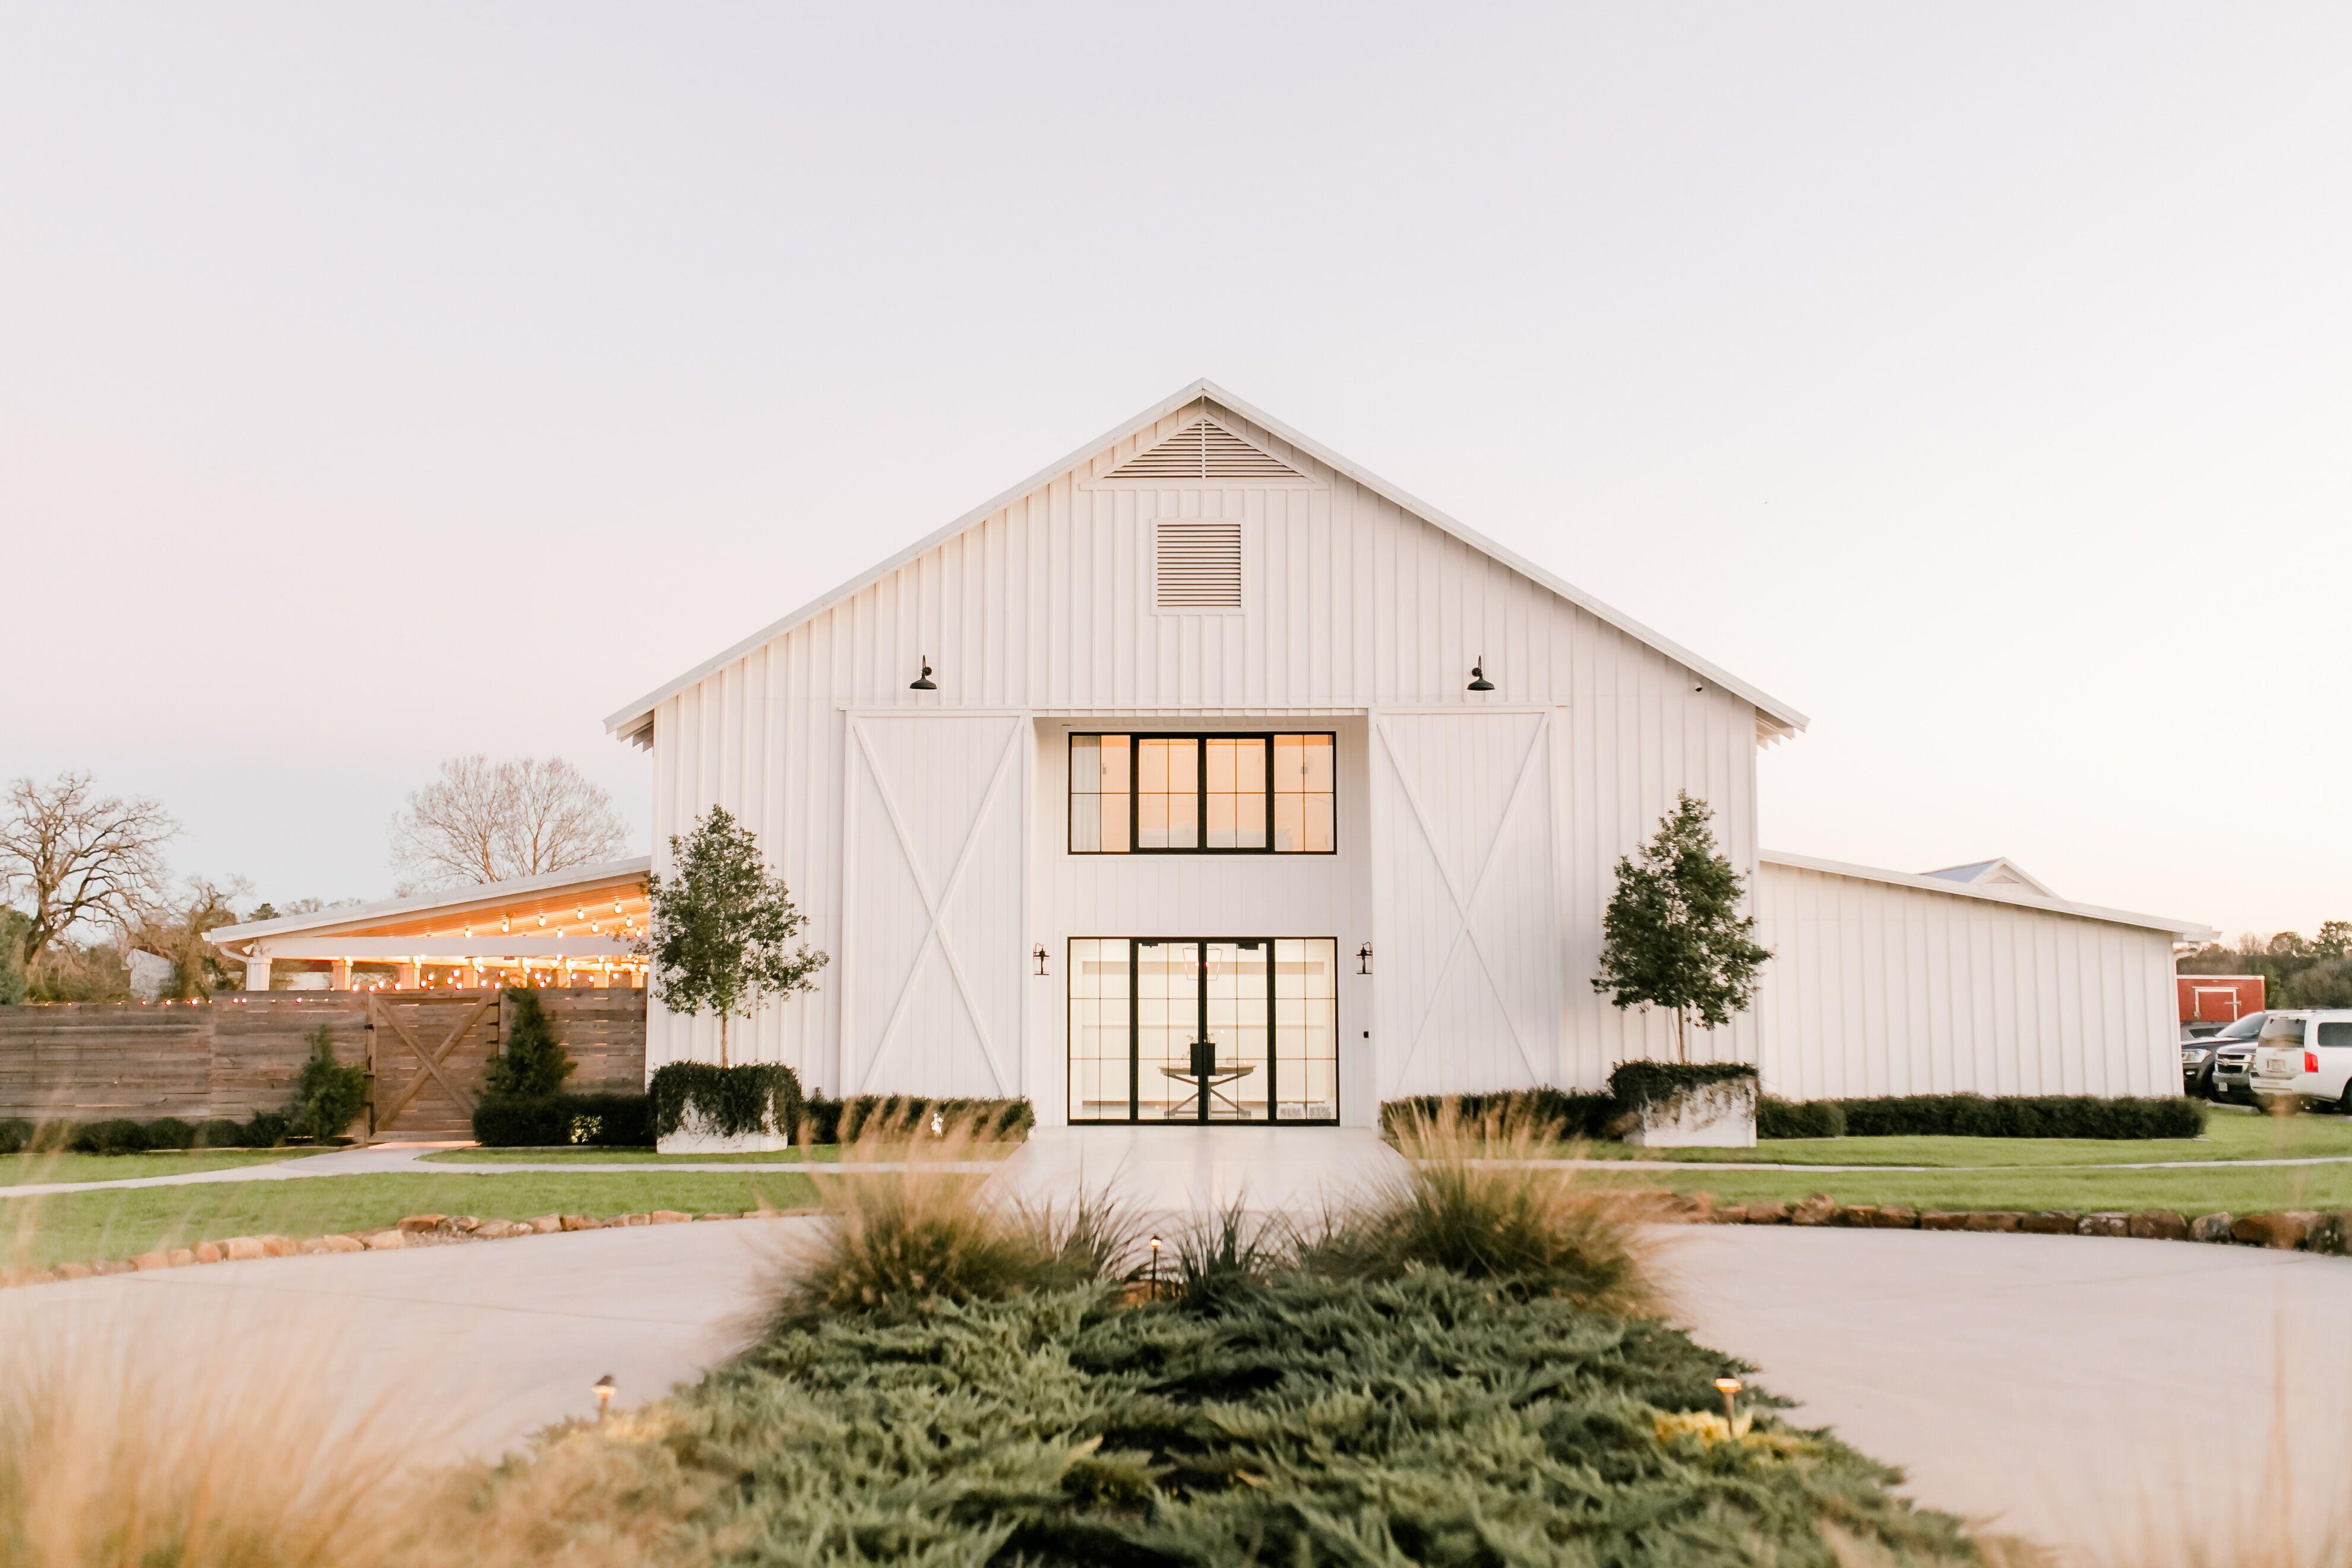 The Farmhouse Reception Venues The Knot